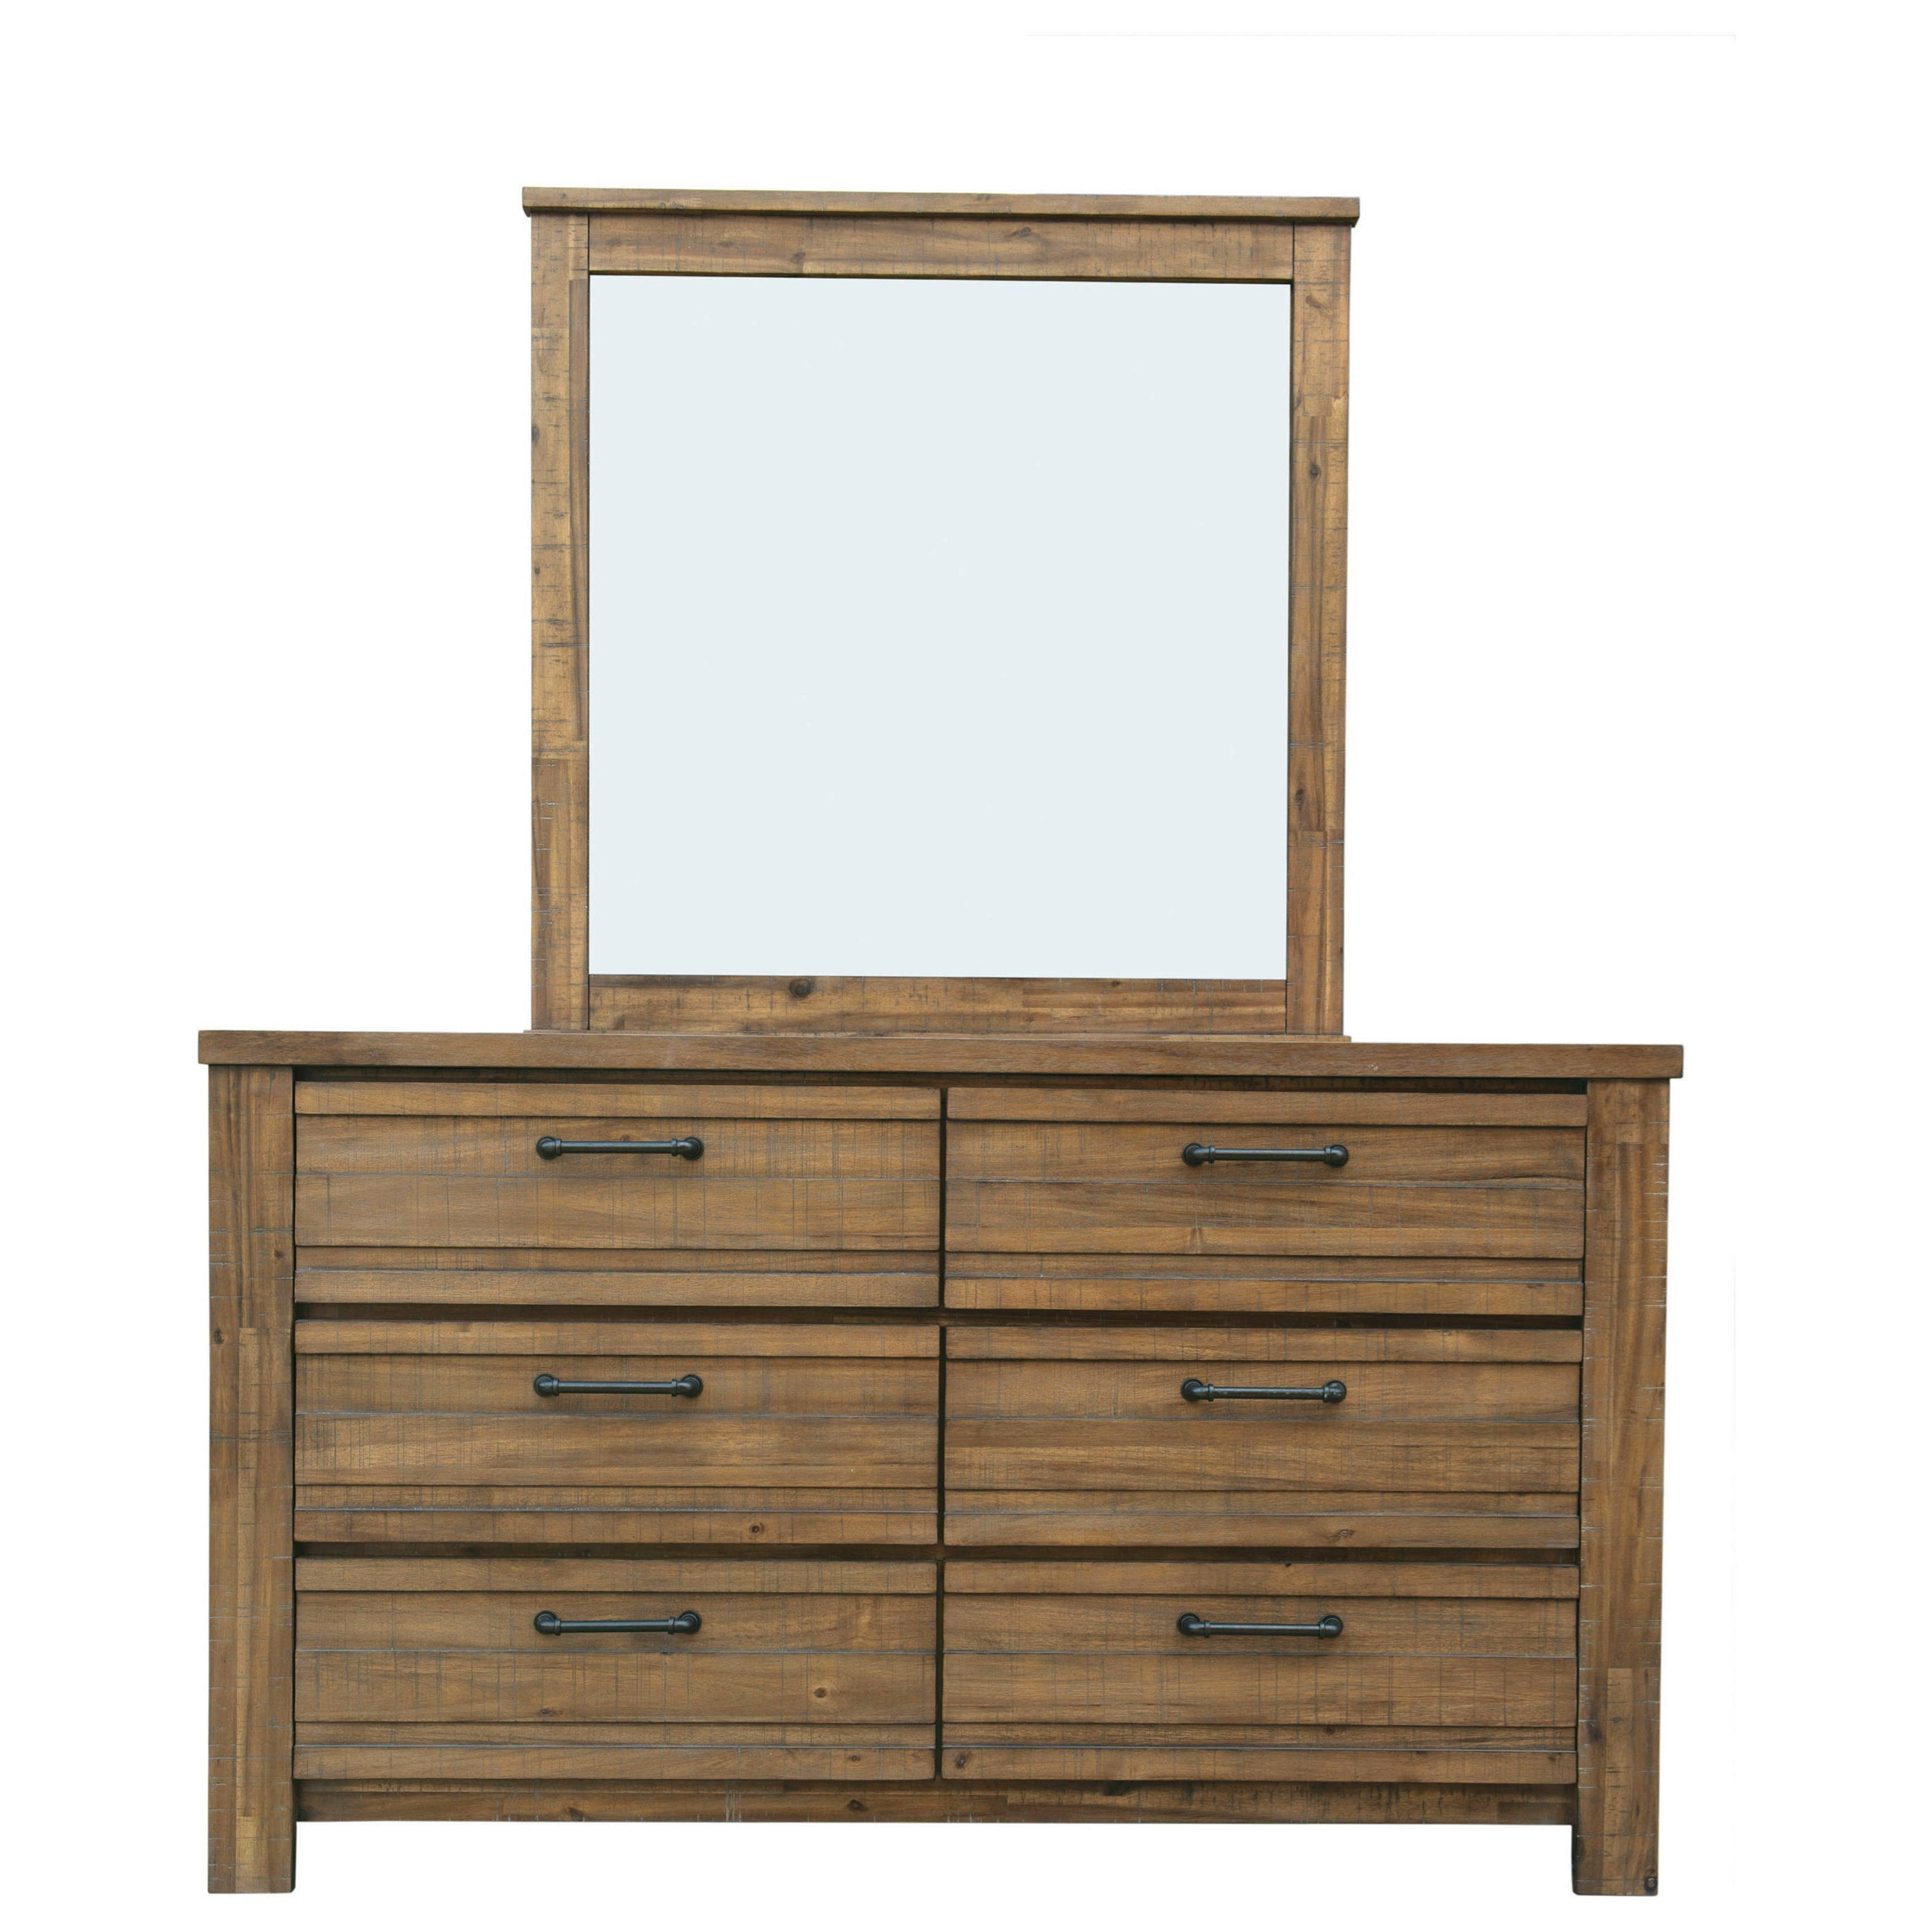 SoHo Dresser and Mirror Combo by Samuel Lawrence at Carolina Direct